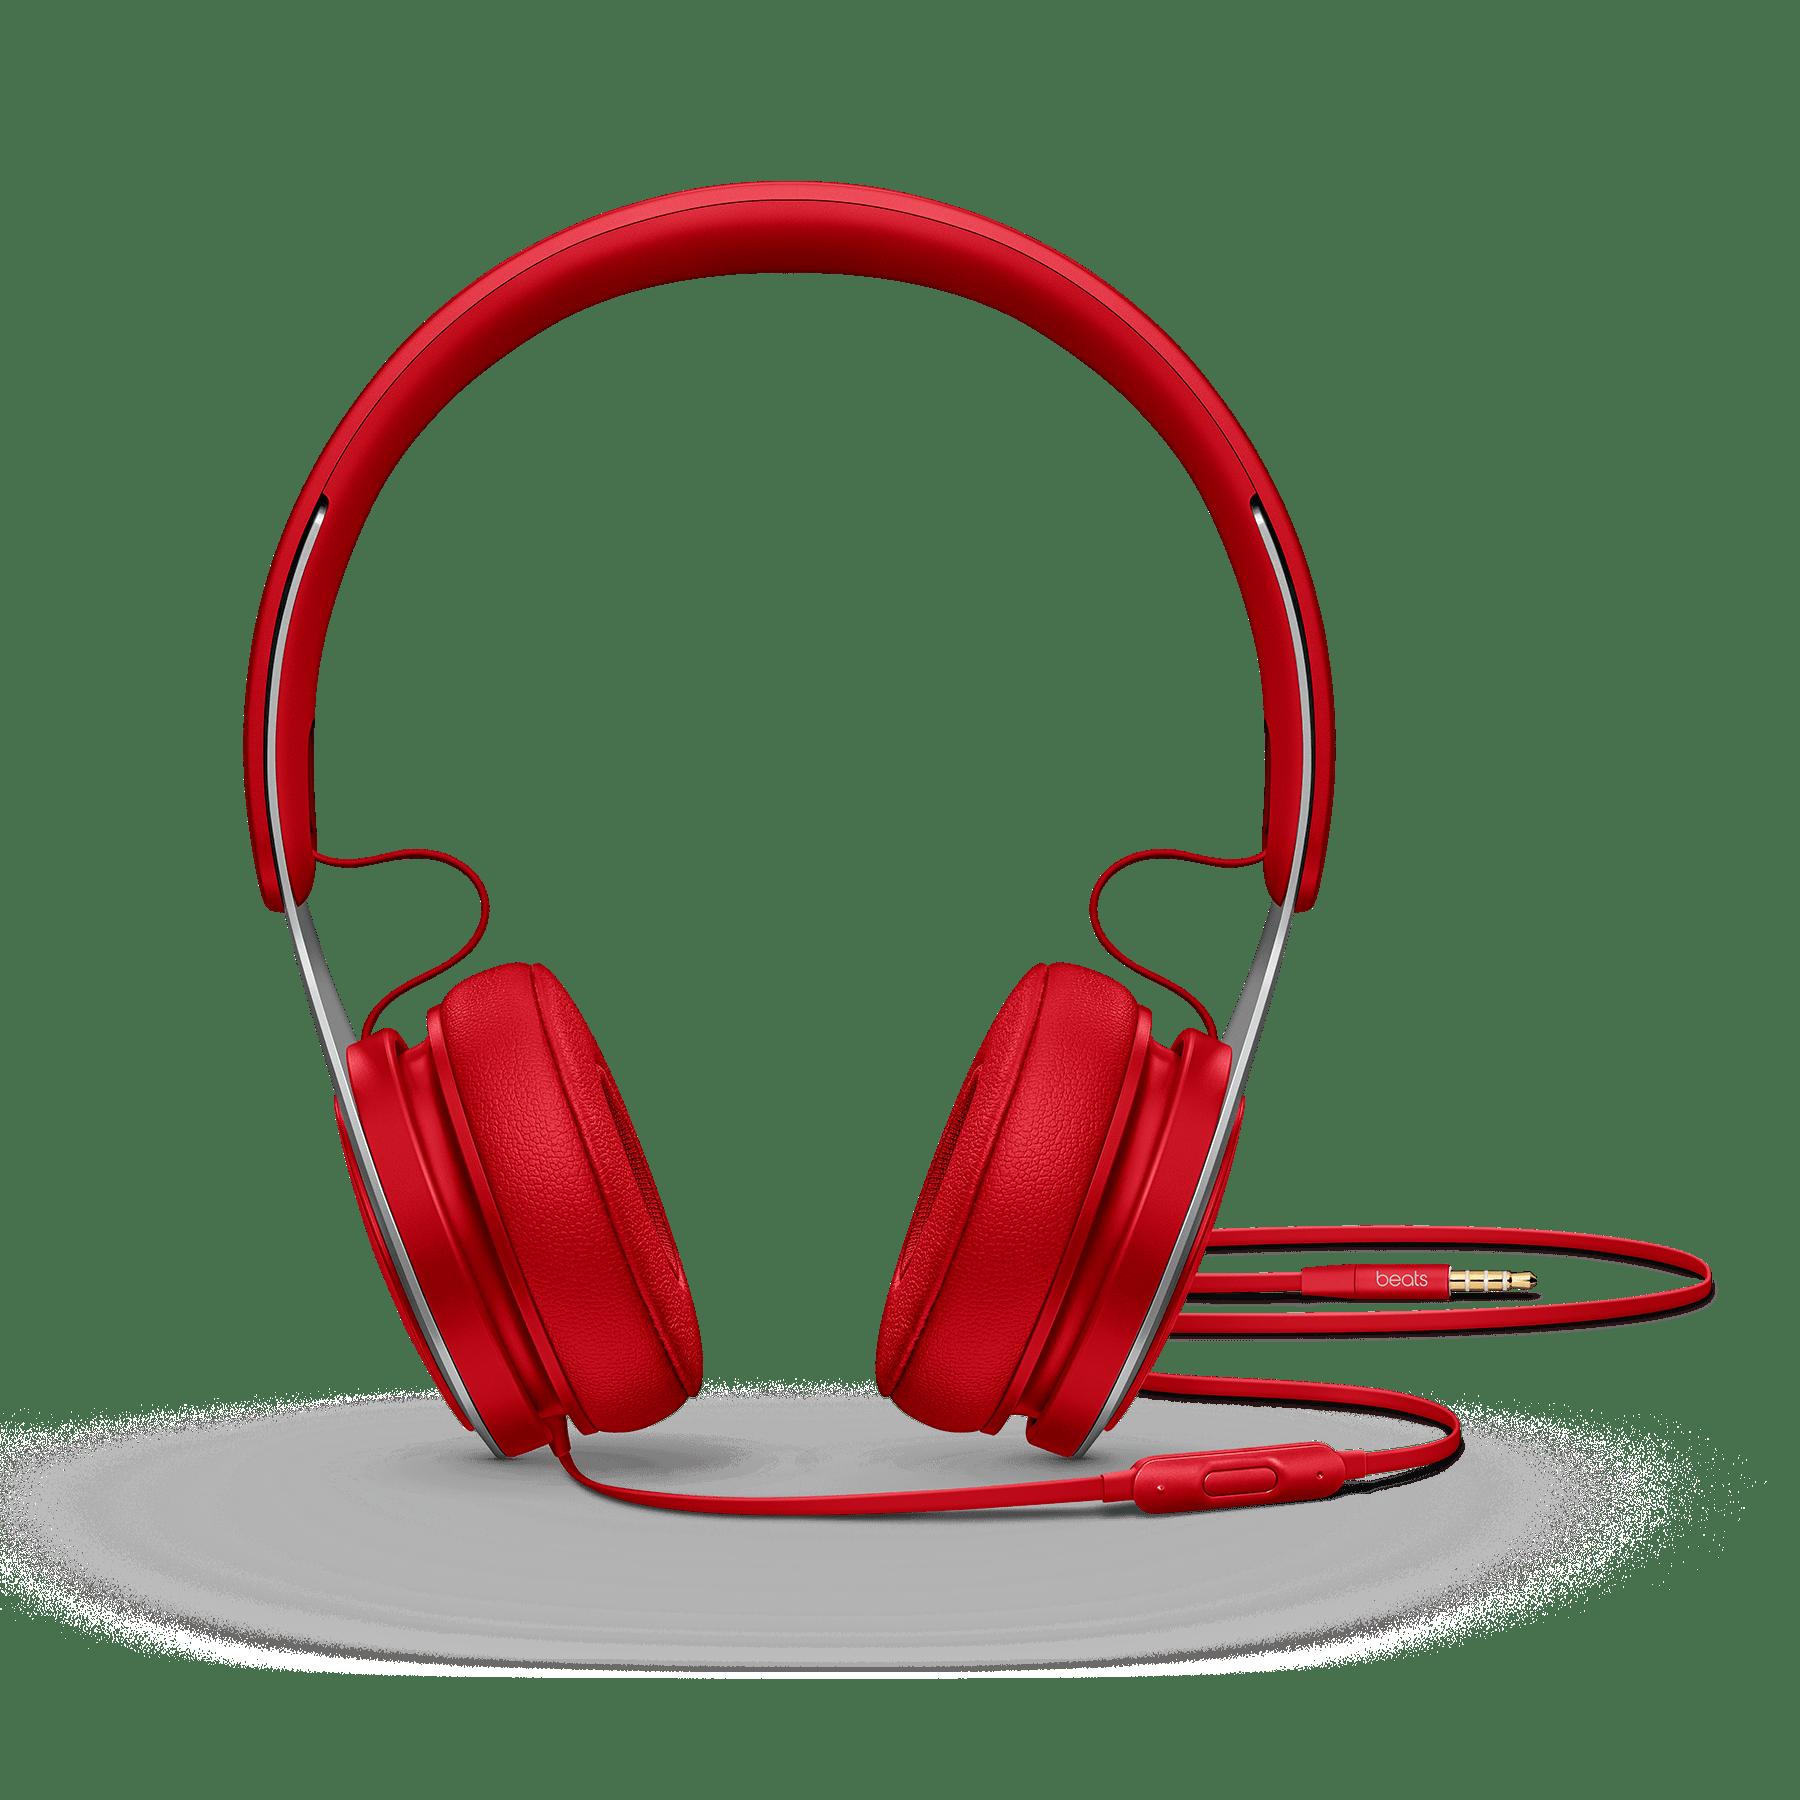 Colors clipart headphone. Beats ep by dre